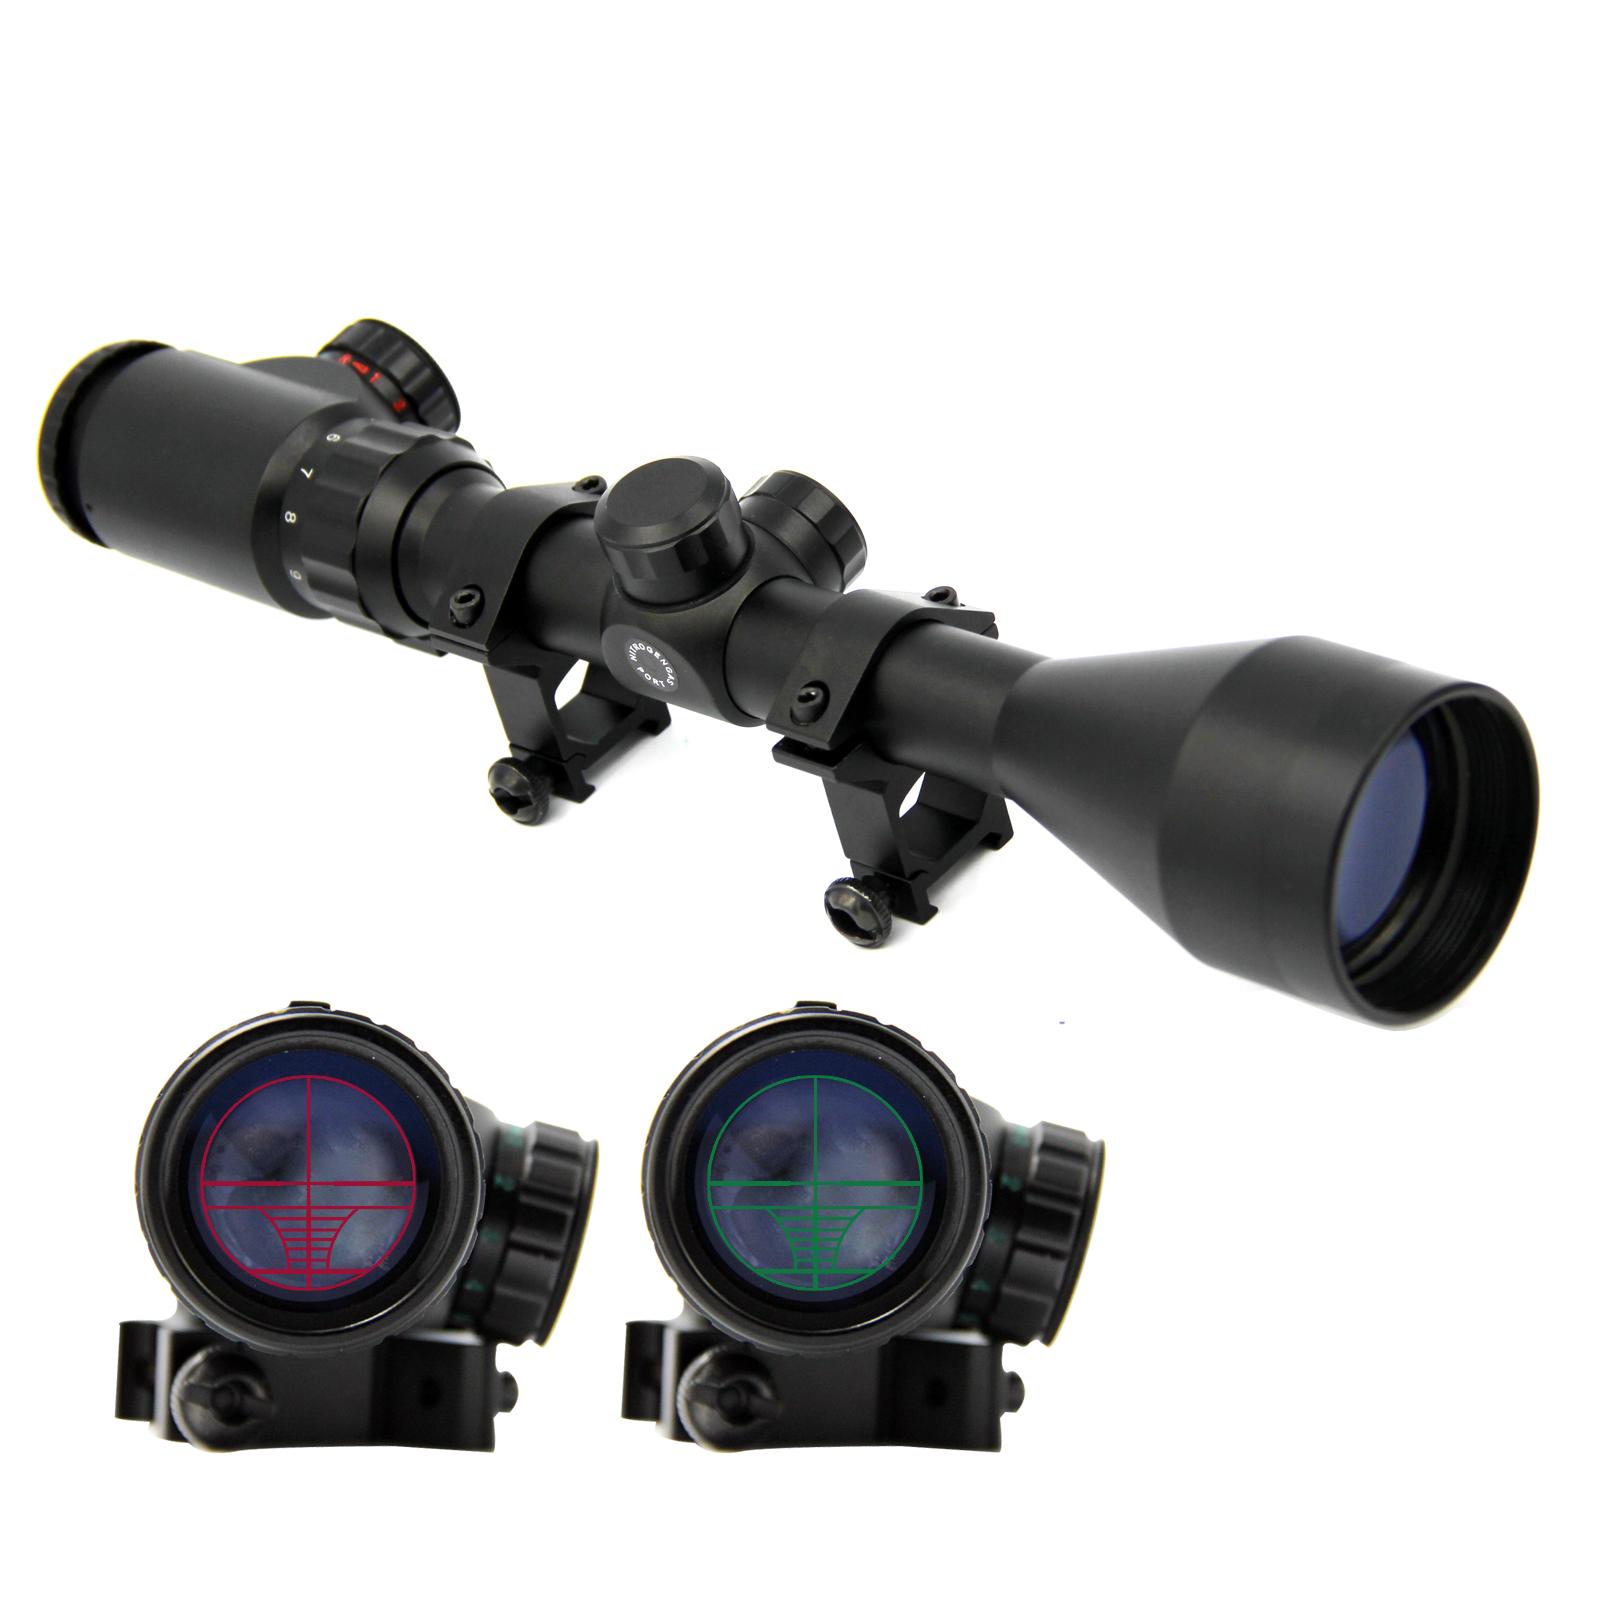 SOLOMONE CAVALLI 3-9X50 E Mil-dot Illuminated Red & Green Hunting Scope Optical Gun for Rifle by SOLOMONE CAVALLI